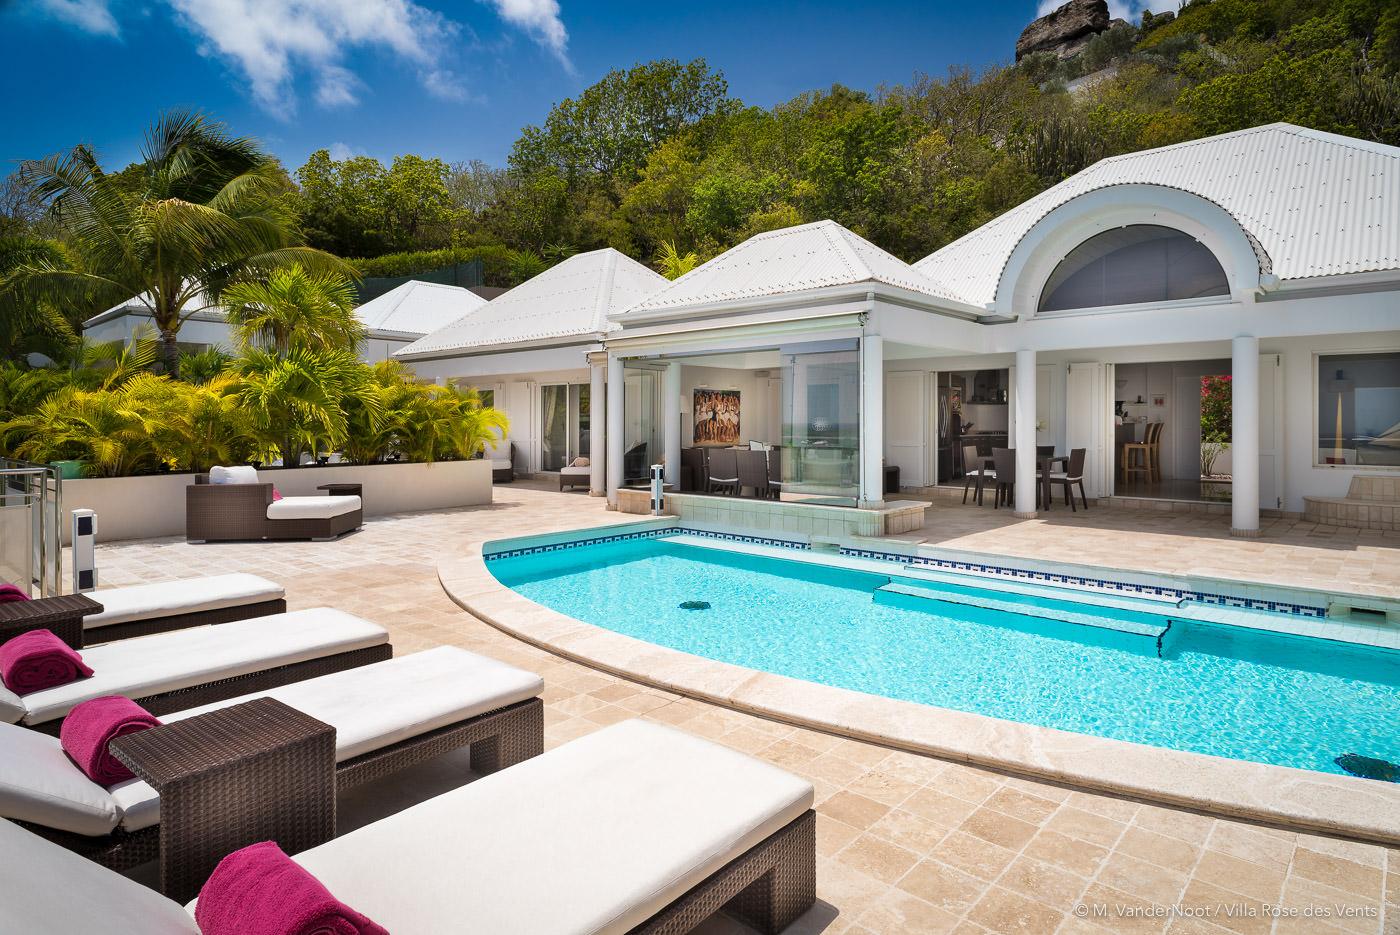 location saisonni re villa 4 chambres st barth st barthelemy. Black Bedroom Furniture Sets. Home Design Ideas